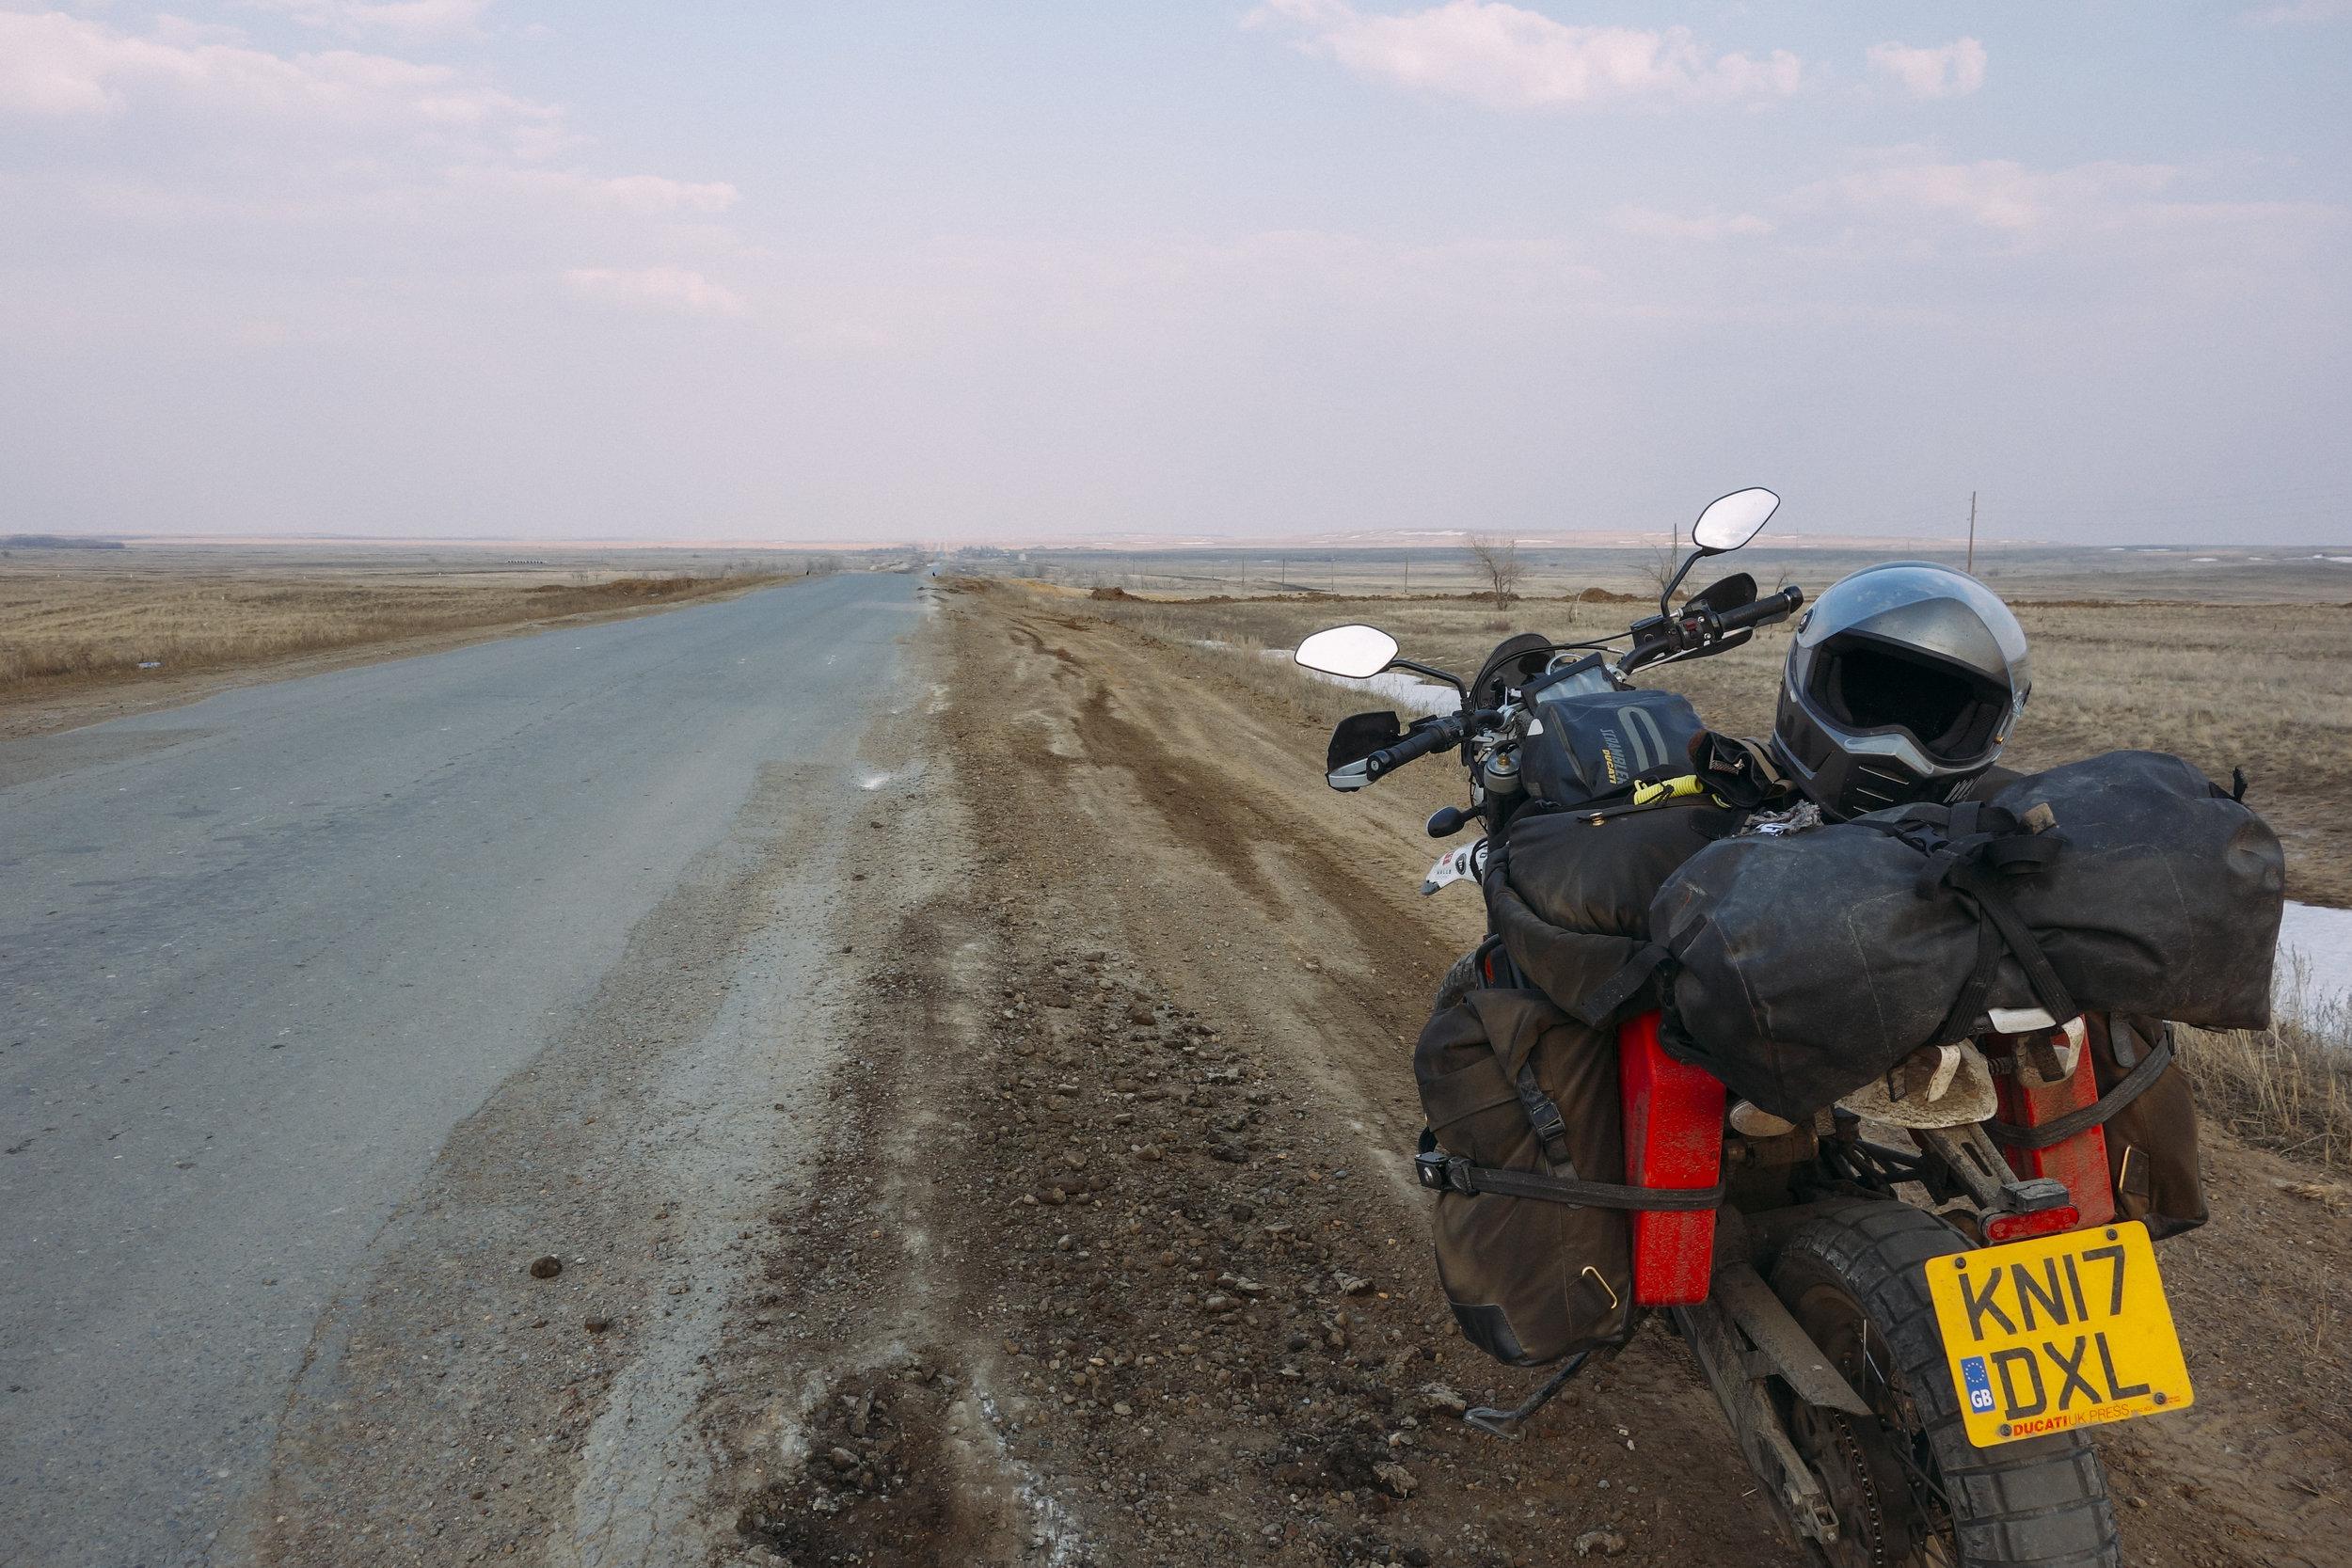 Henry-Crew-35000Miles-Adventure-Rider_Radio-Motorcycle-Podcast-5.jpg